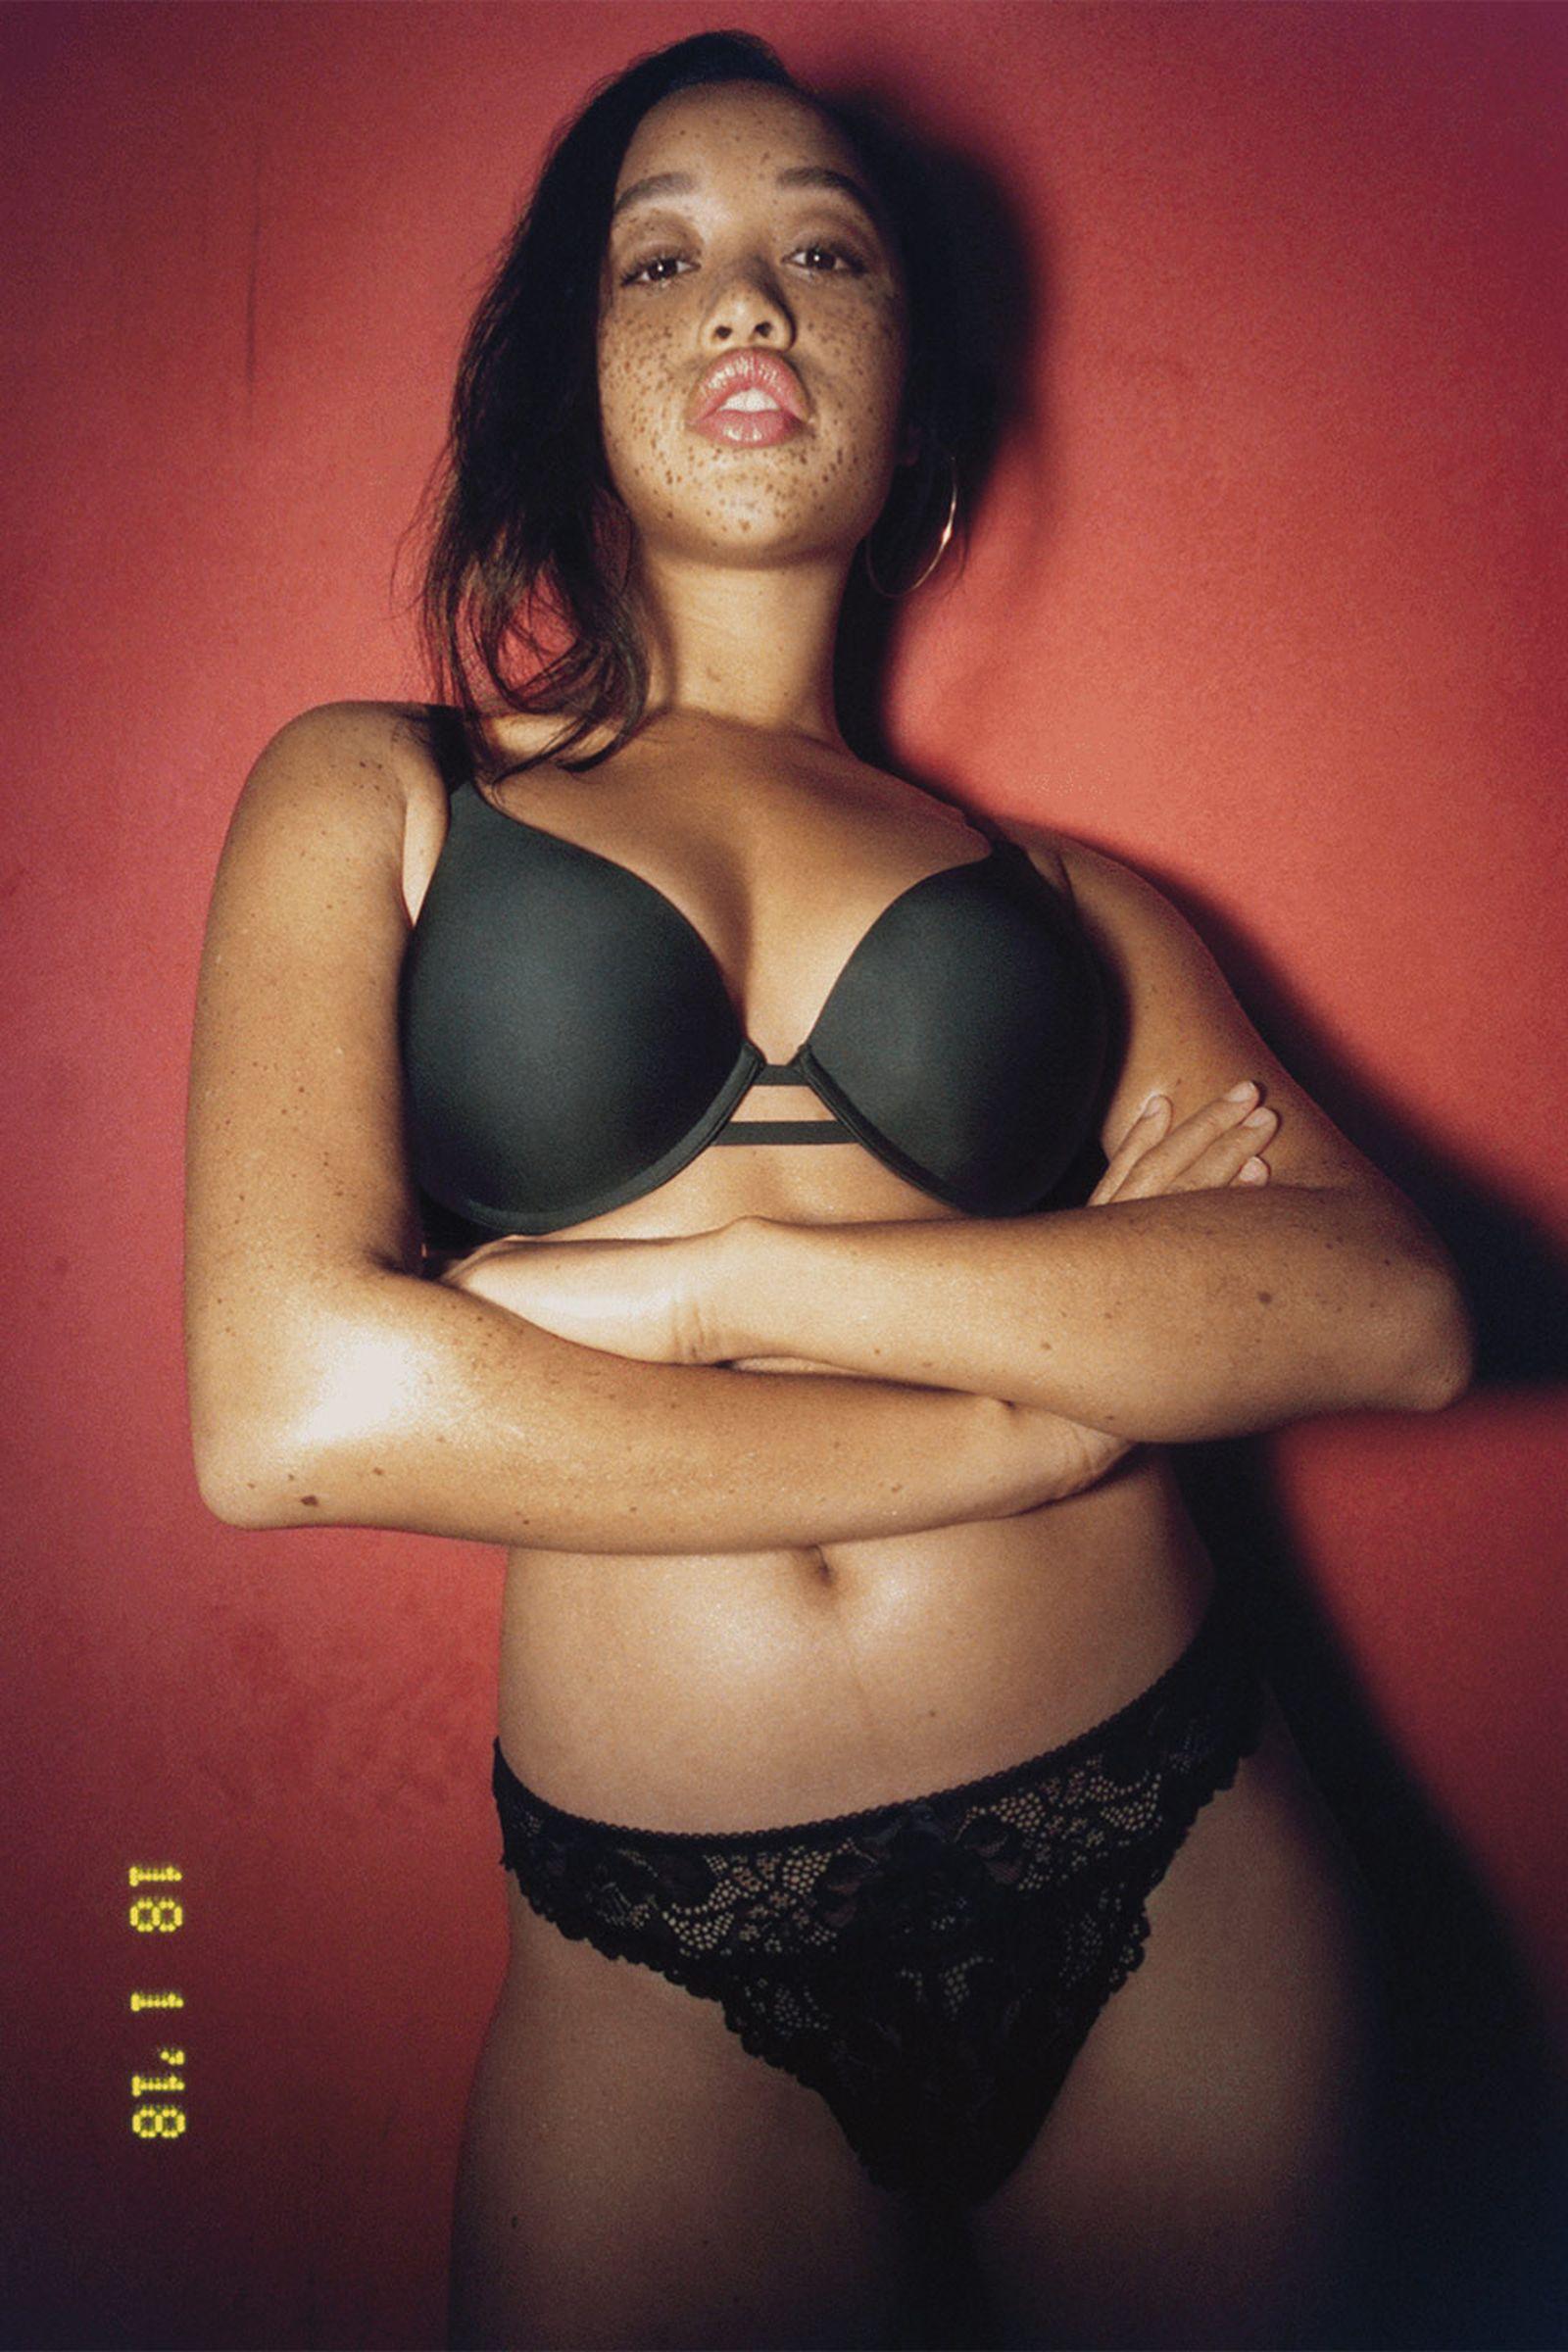 rihanna-savage-fenty-lingerie-first-look-08